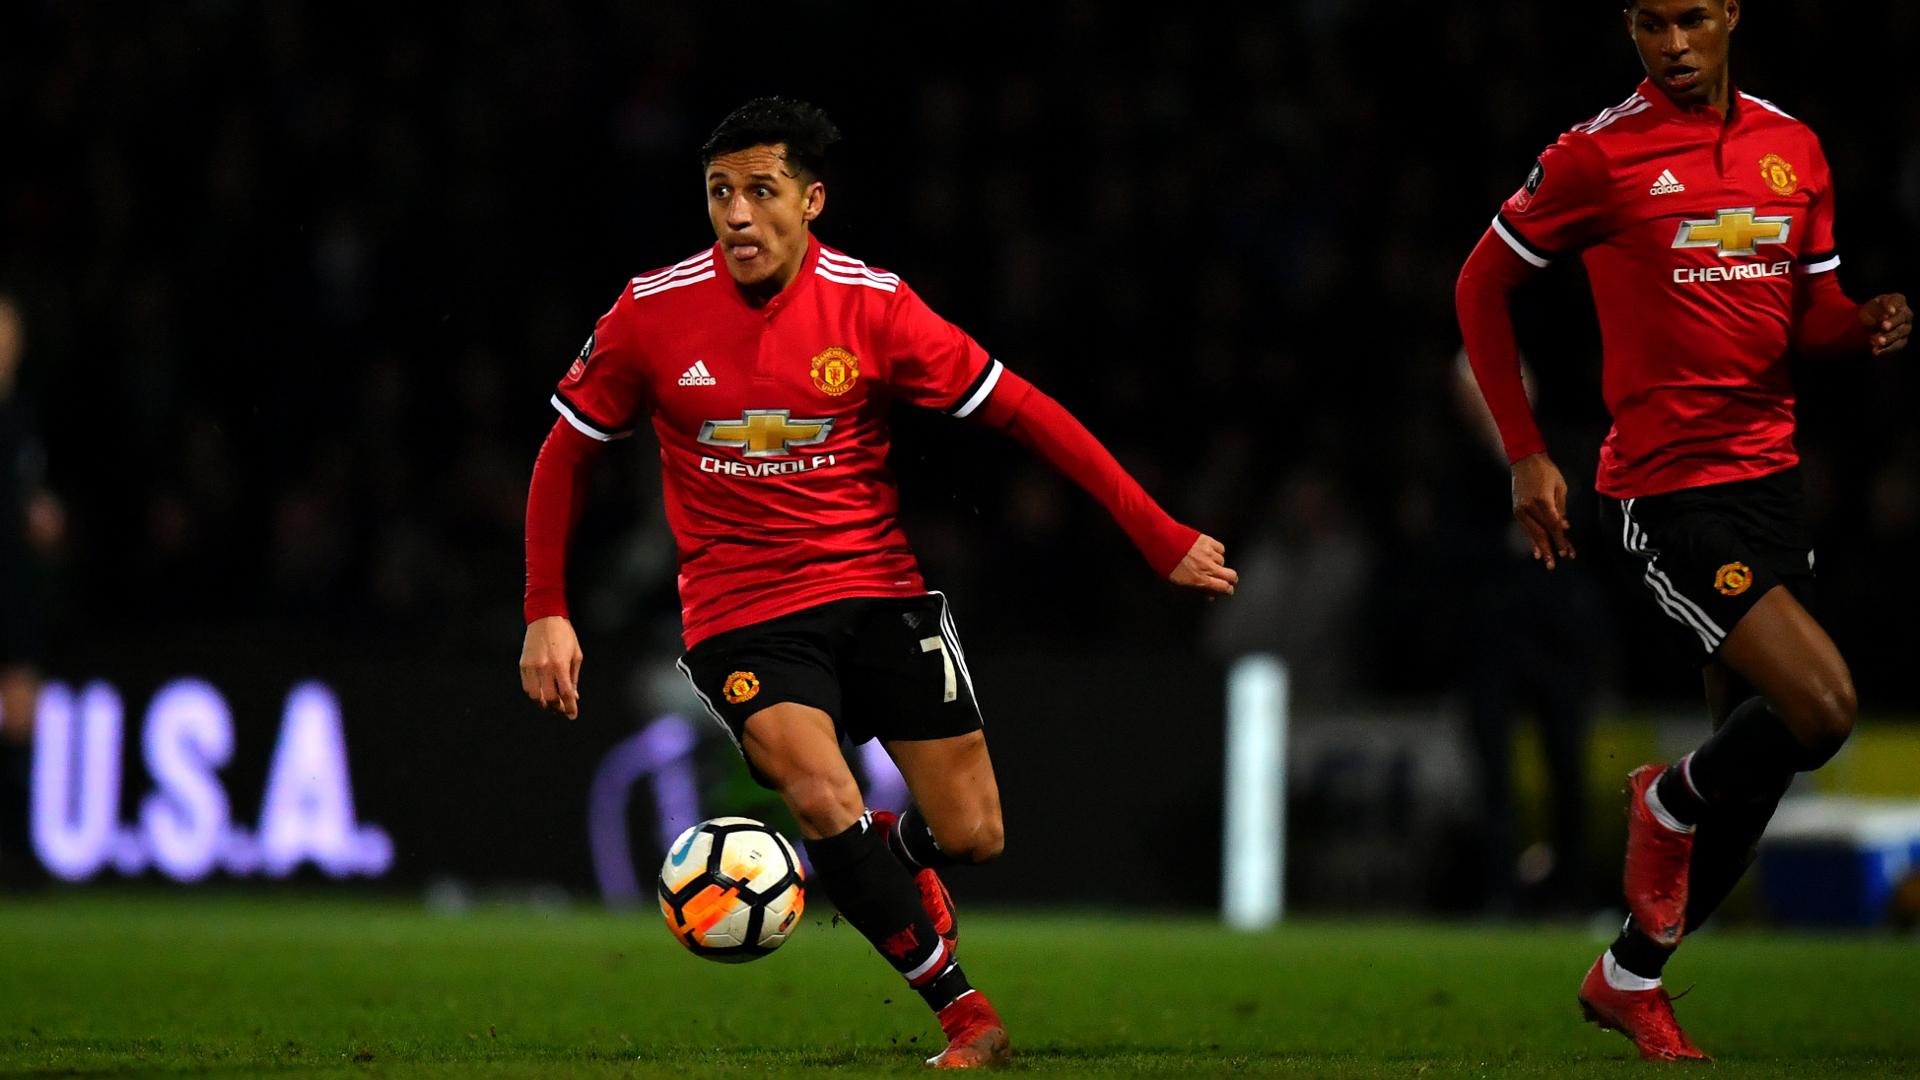 Sanchez stars on manchester united debut to cap mourinhos perfect alexis sanchez manchester united voltagebd Image collections